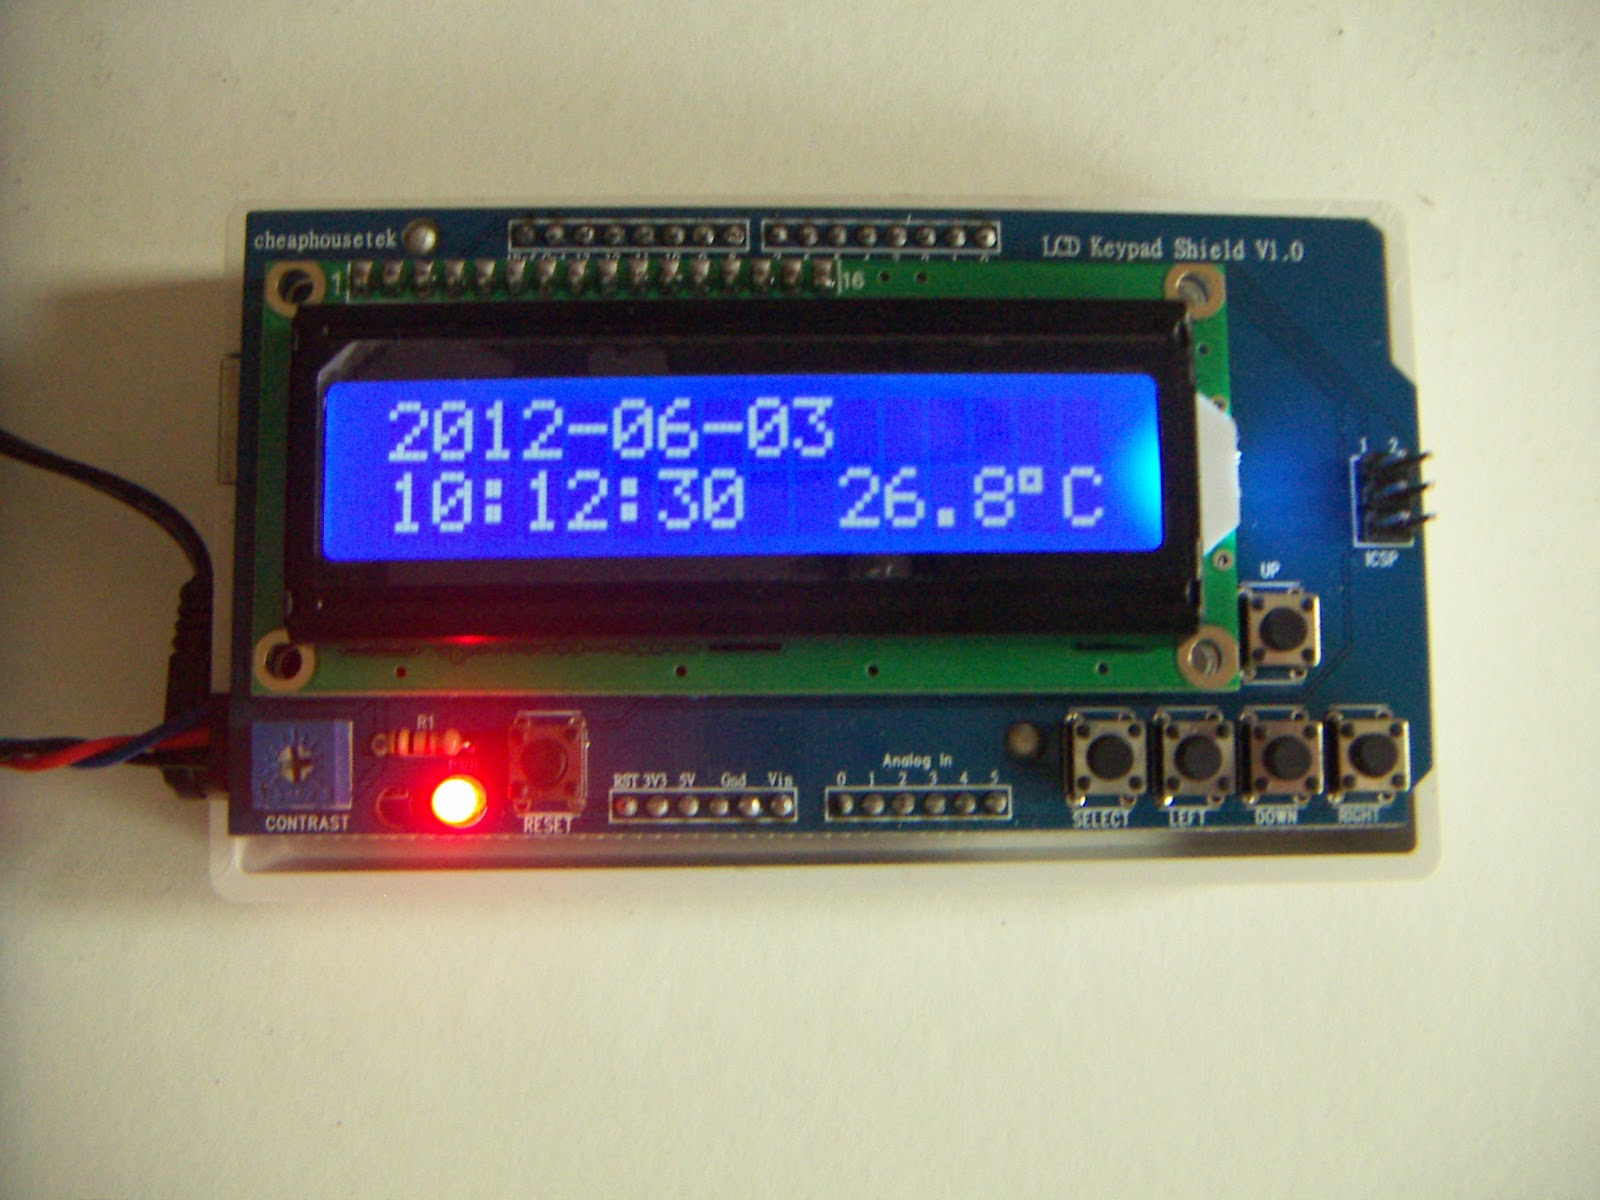 cheaphousetek: Freeduino/Arduino + Real Time Clock Sensor Shield +